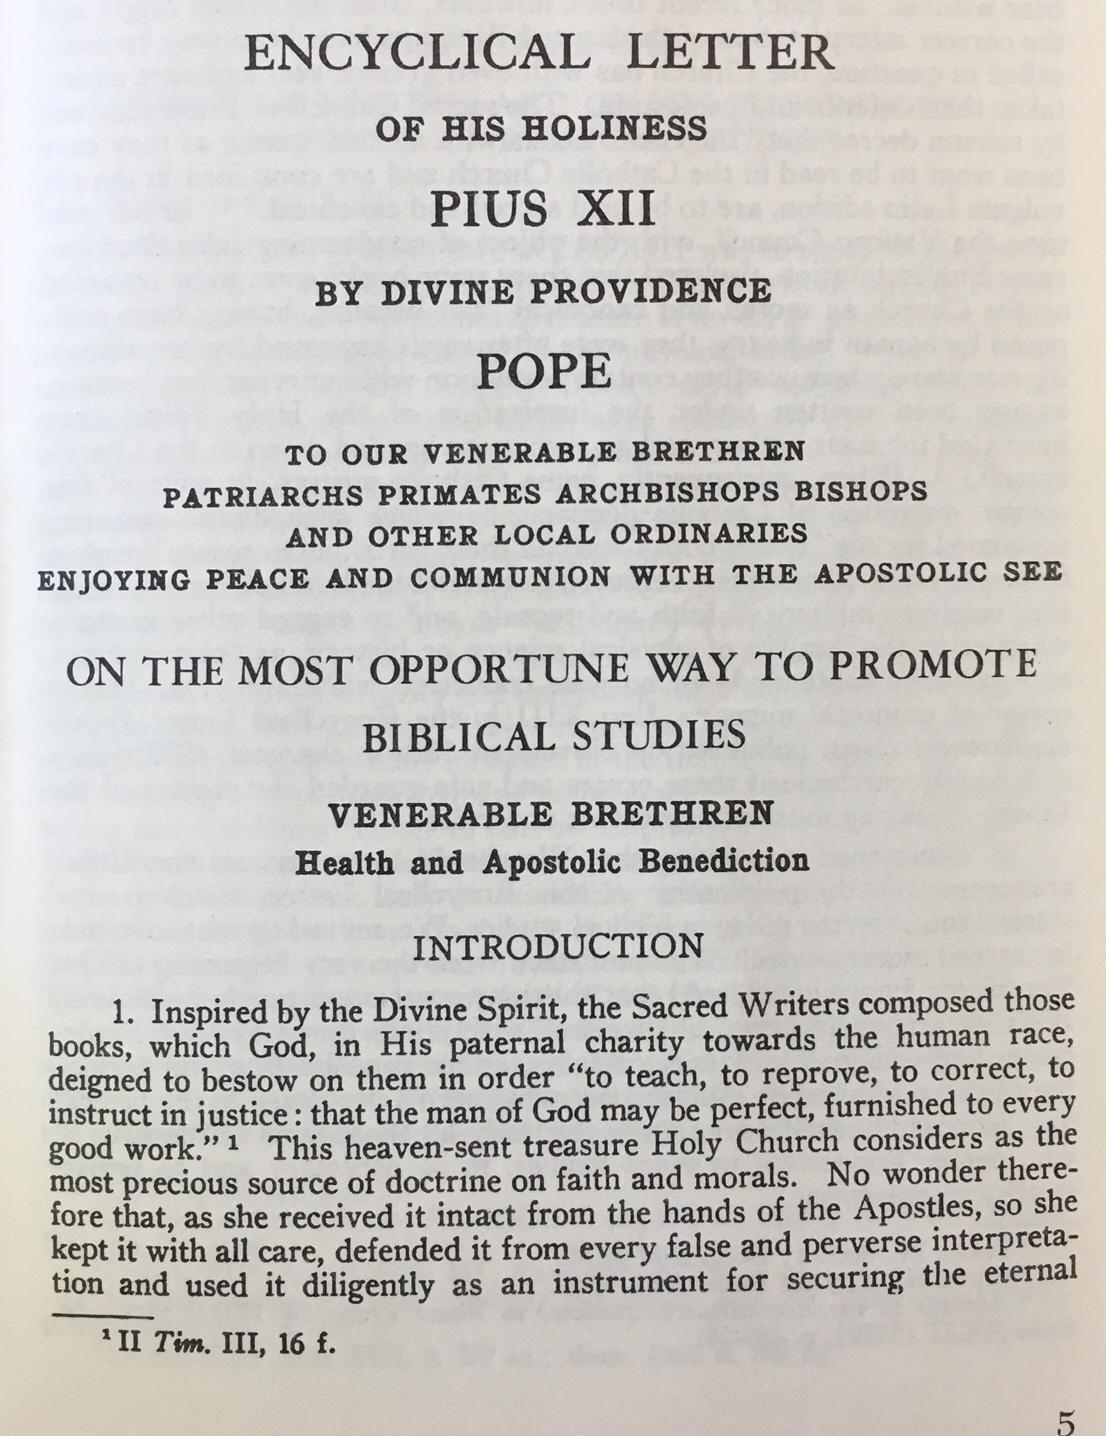 Promotion of Biblical Studies (Divino